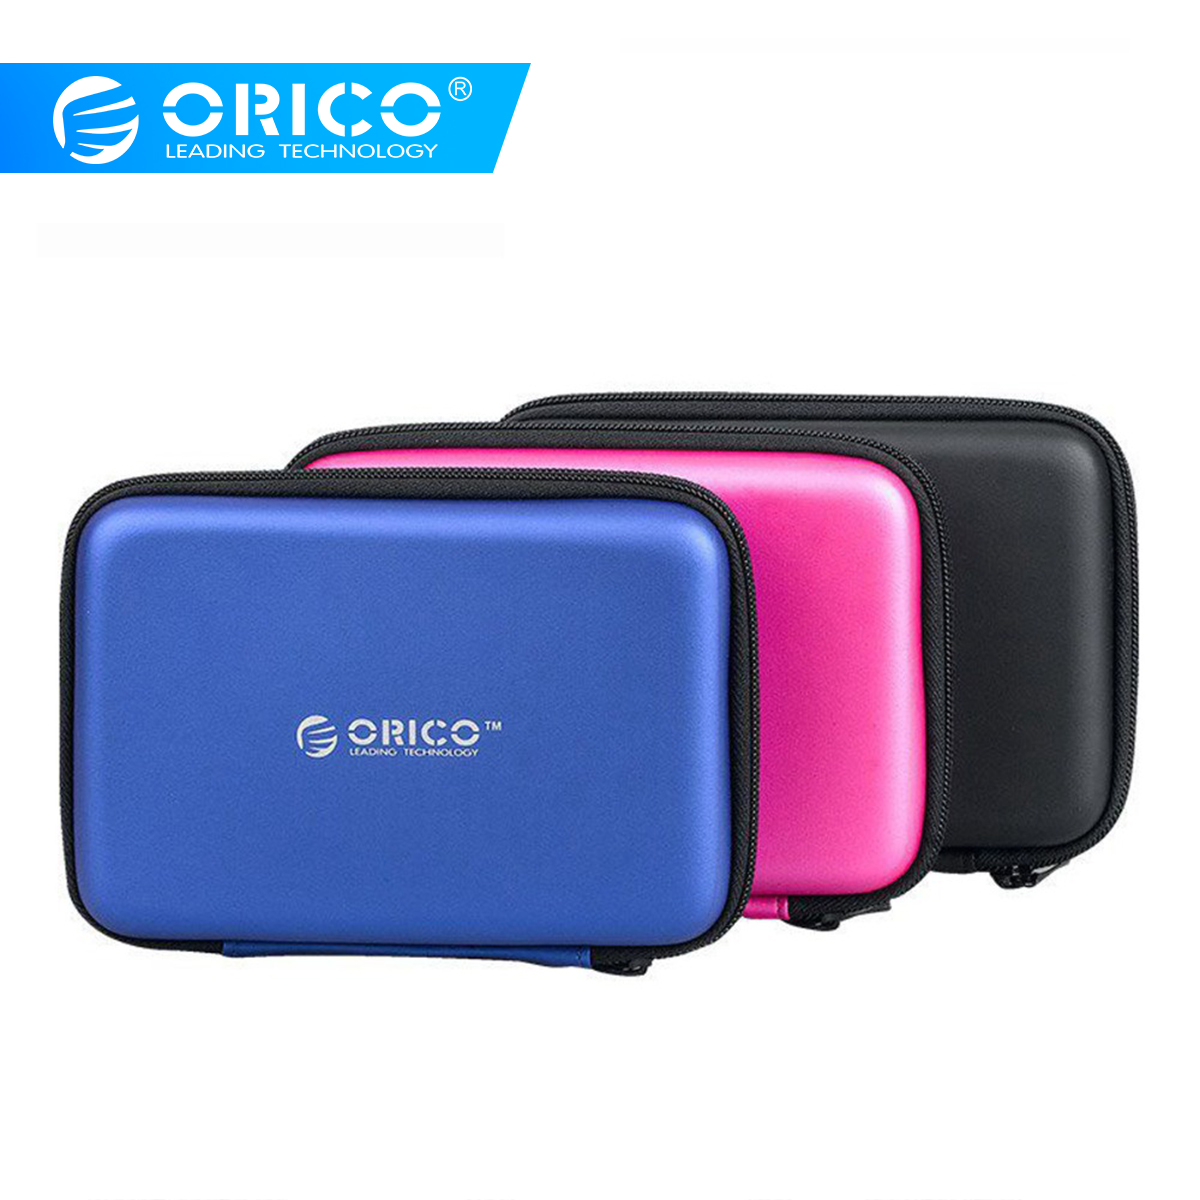 ORICO PHB-25 2.5